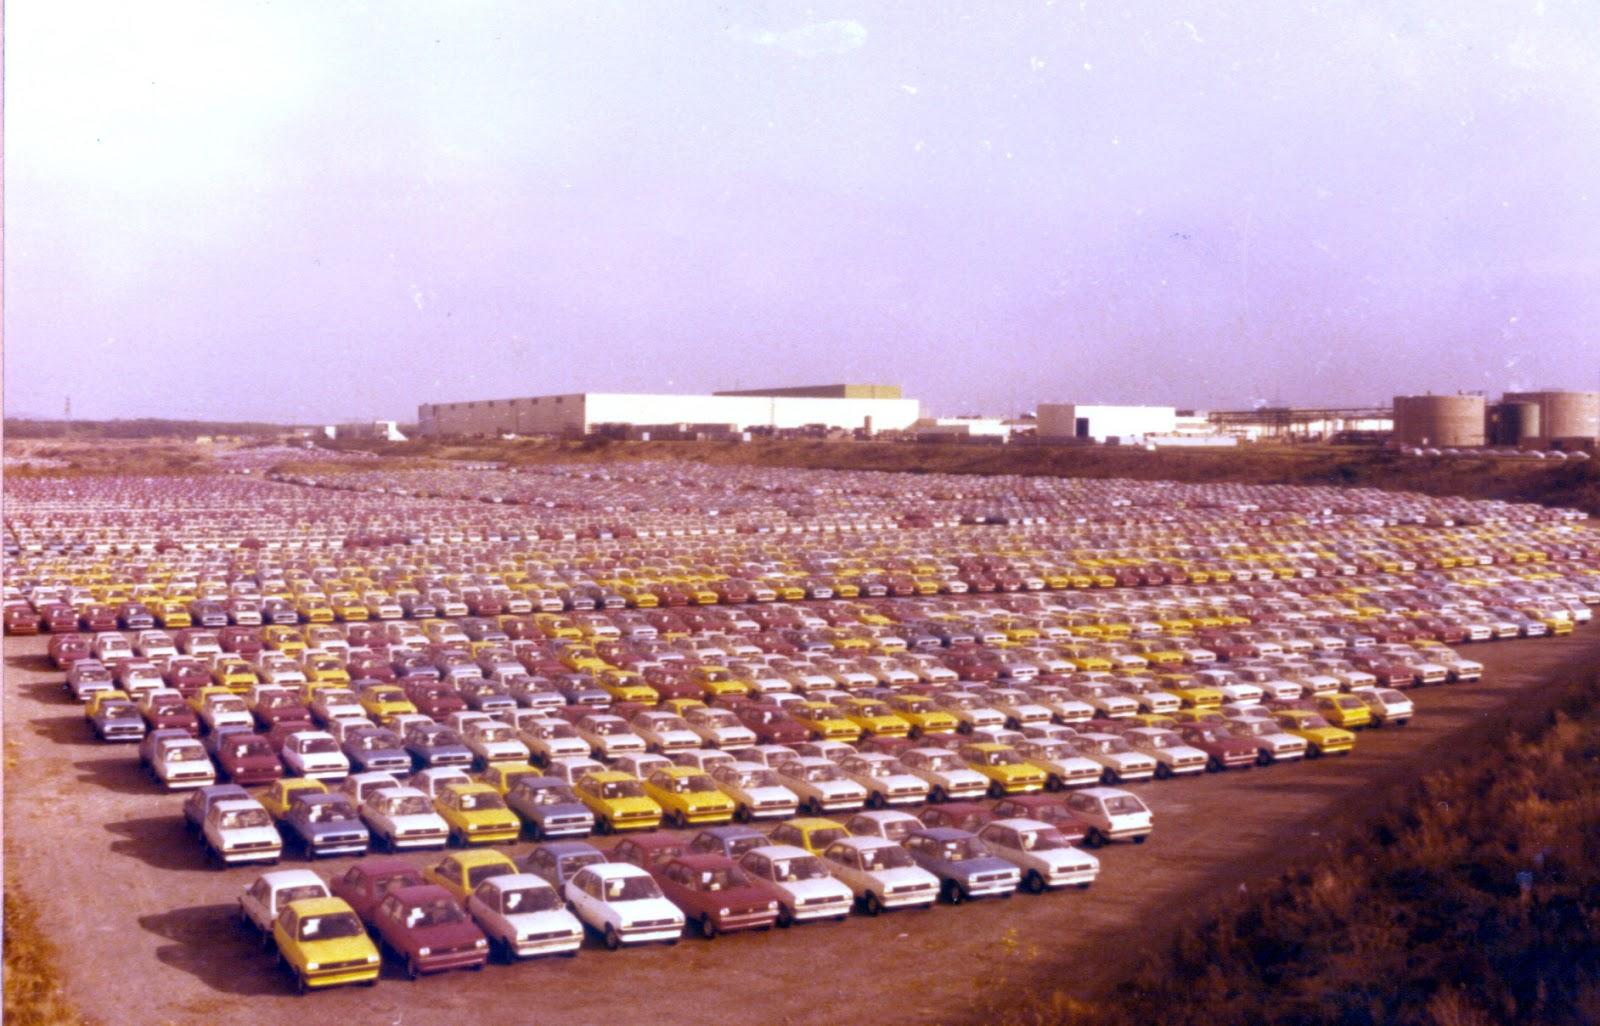 FordFiesta 1976 1983 Saarlouisparking 1978 01 Έκανες Πολύ Δρόμο Μωρό μου! - Το Ford Fiesta Γίνεται 40 Ετών Ford, Ford Fiesta, Fun, videos, zblog